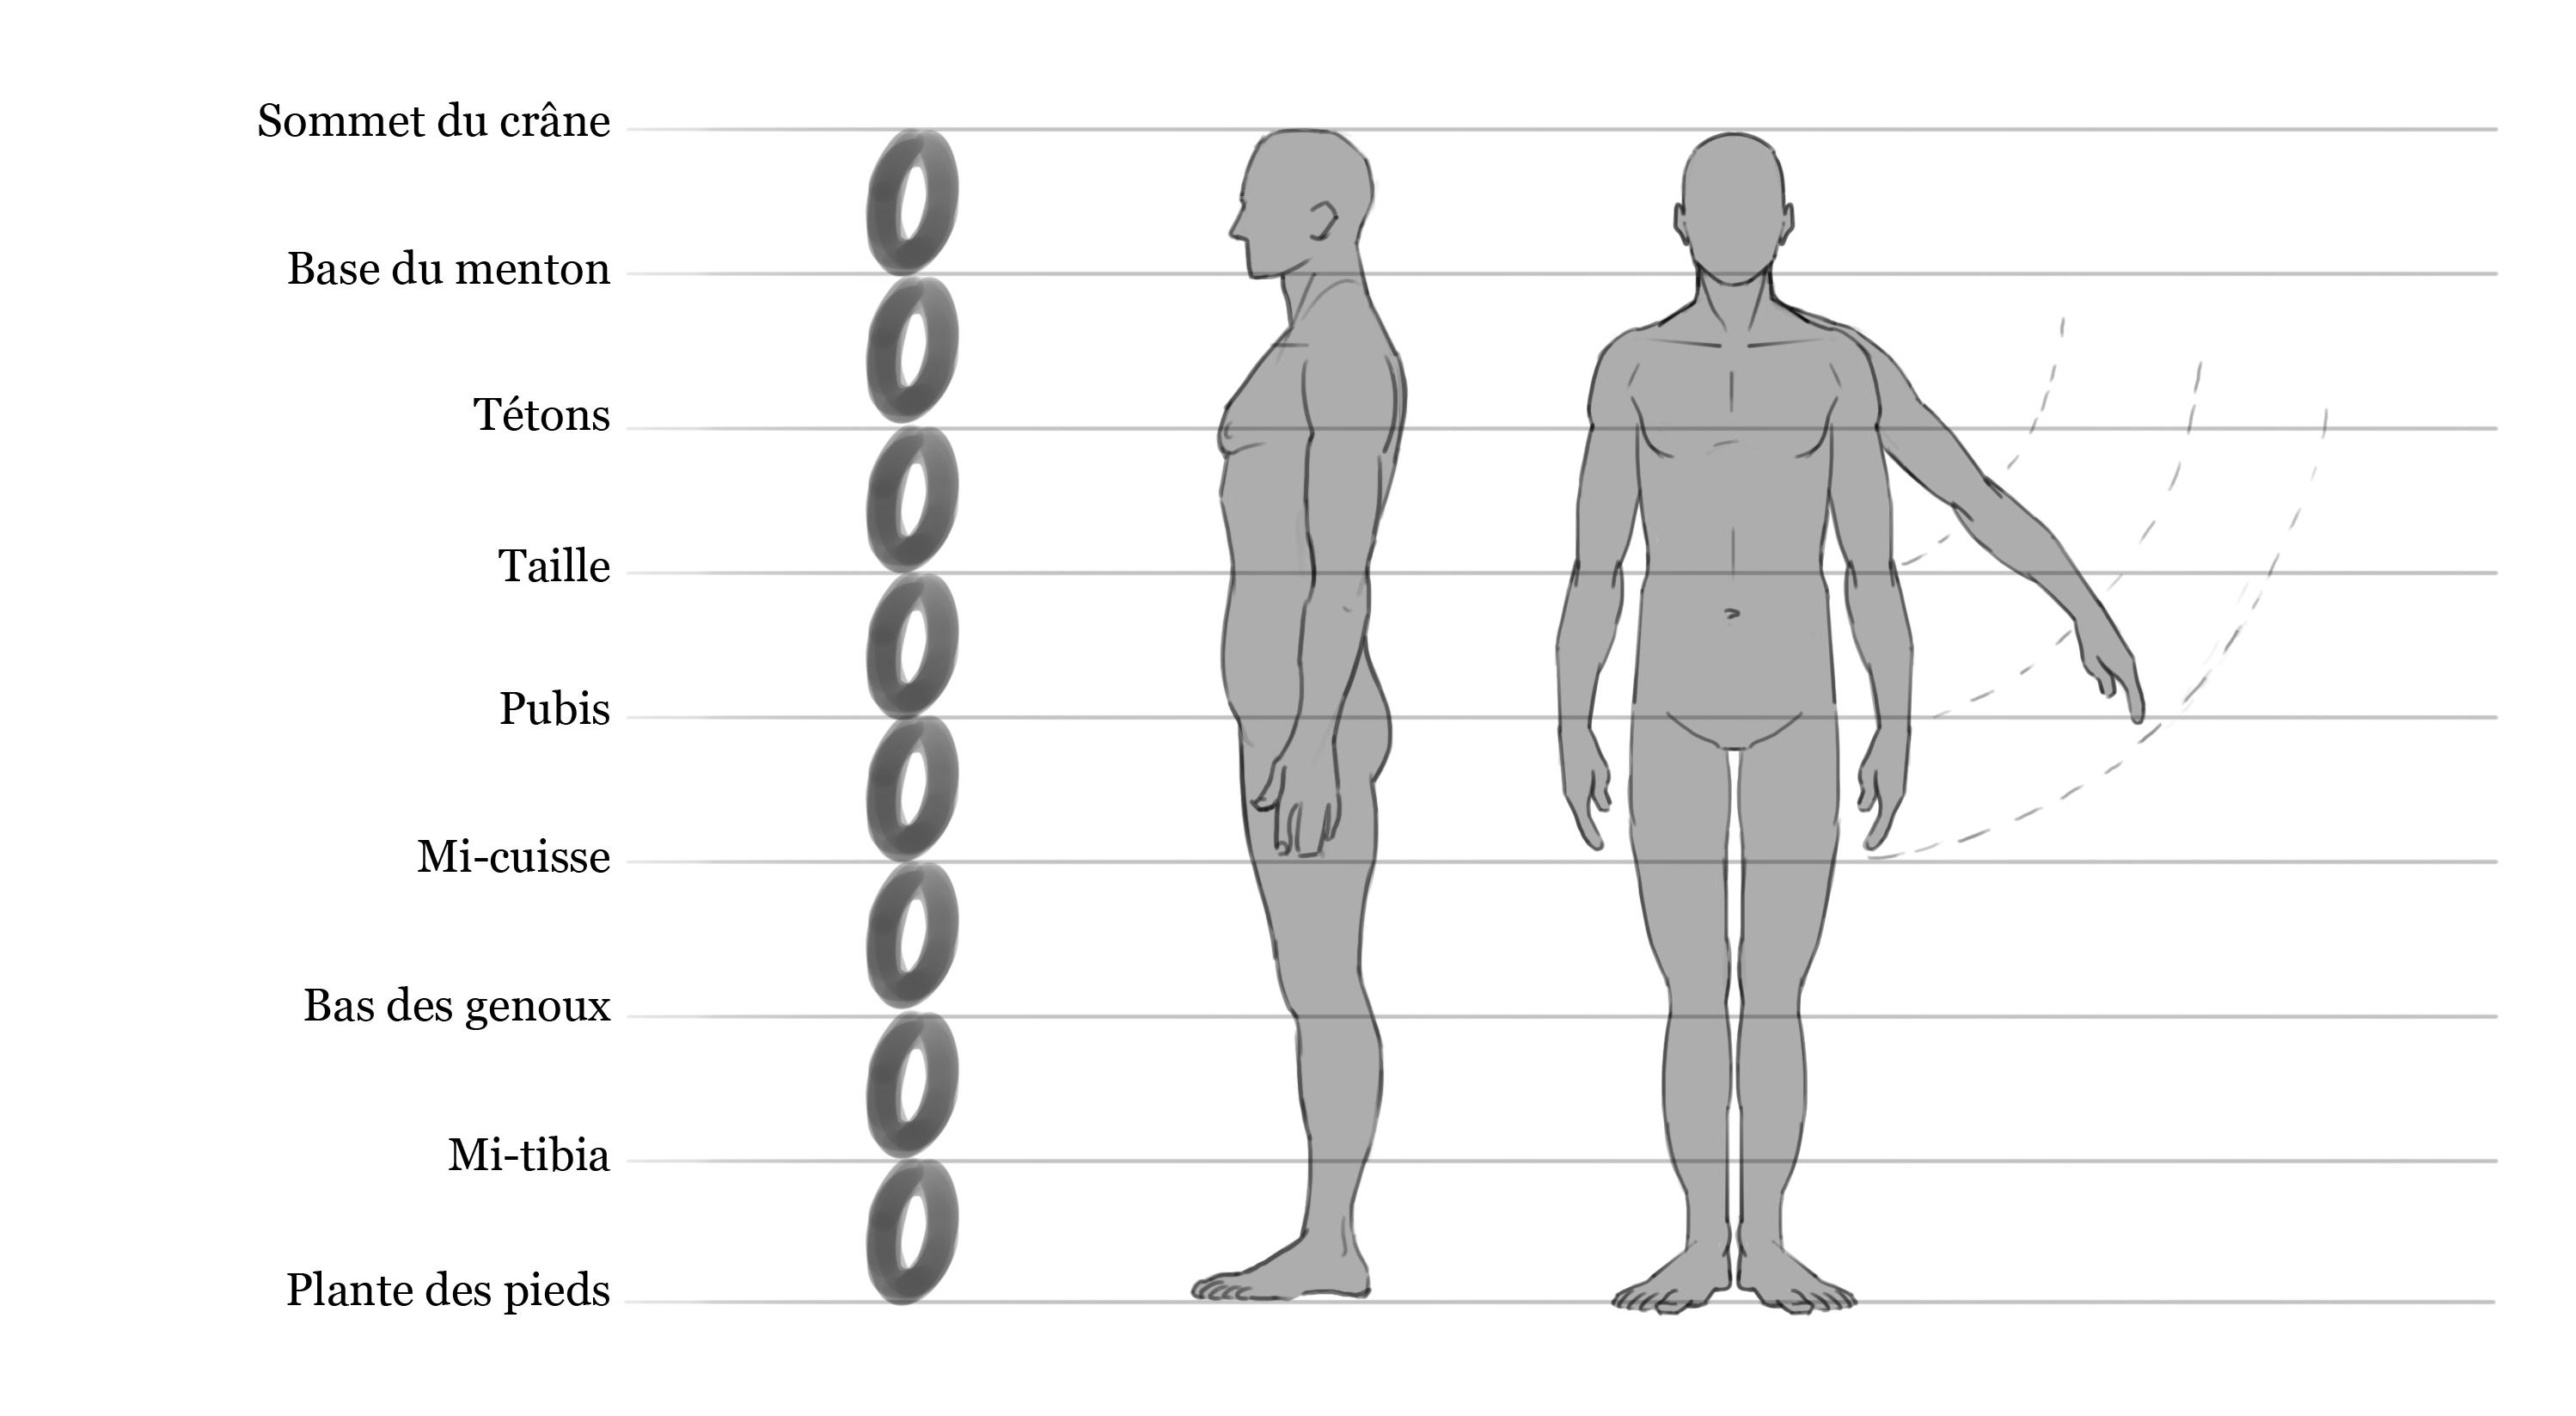 Atemberaubend Anatomie Des Shin Fotos - Anatomie Ideen - finotti.info